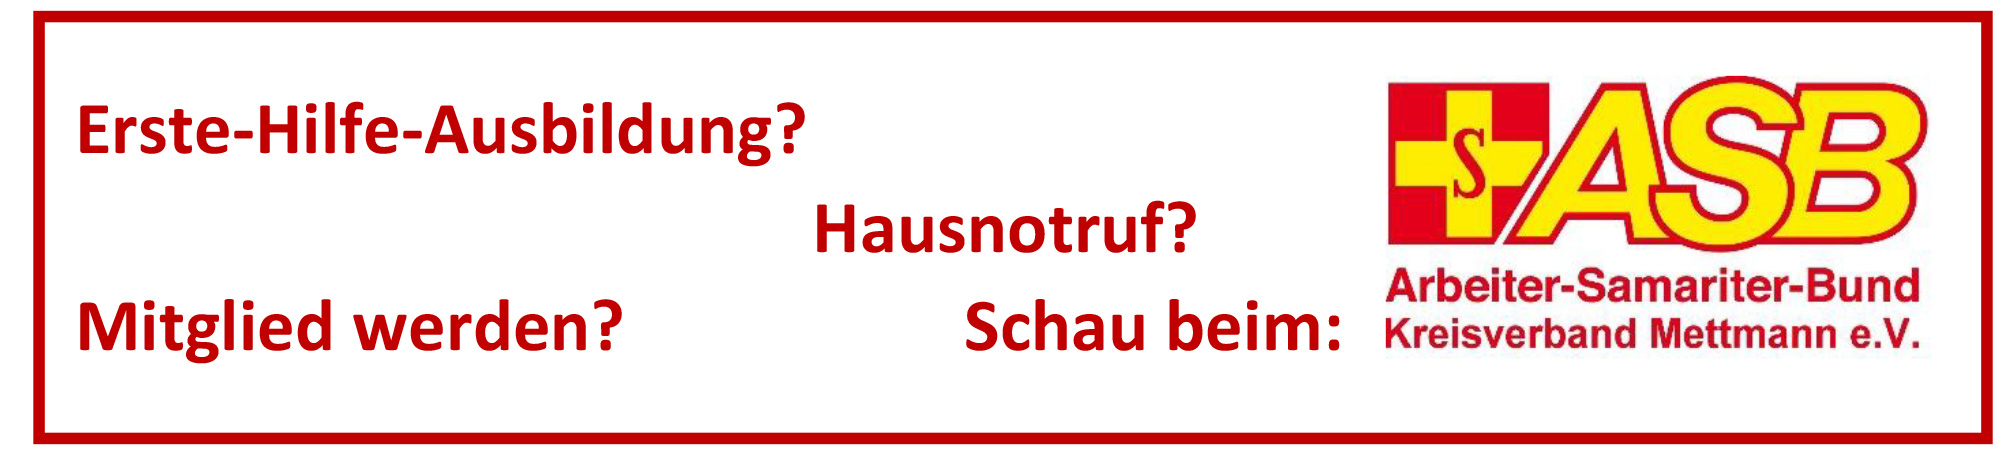 Banner-Monheim-ASB